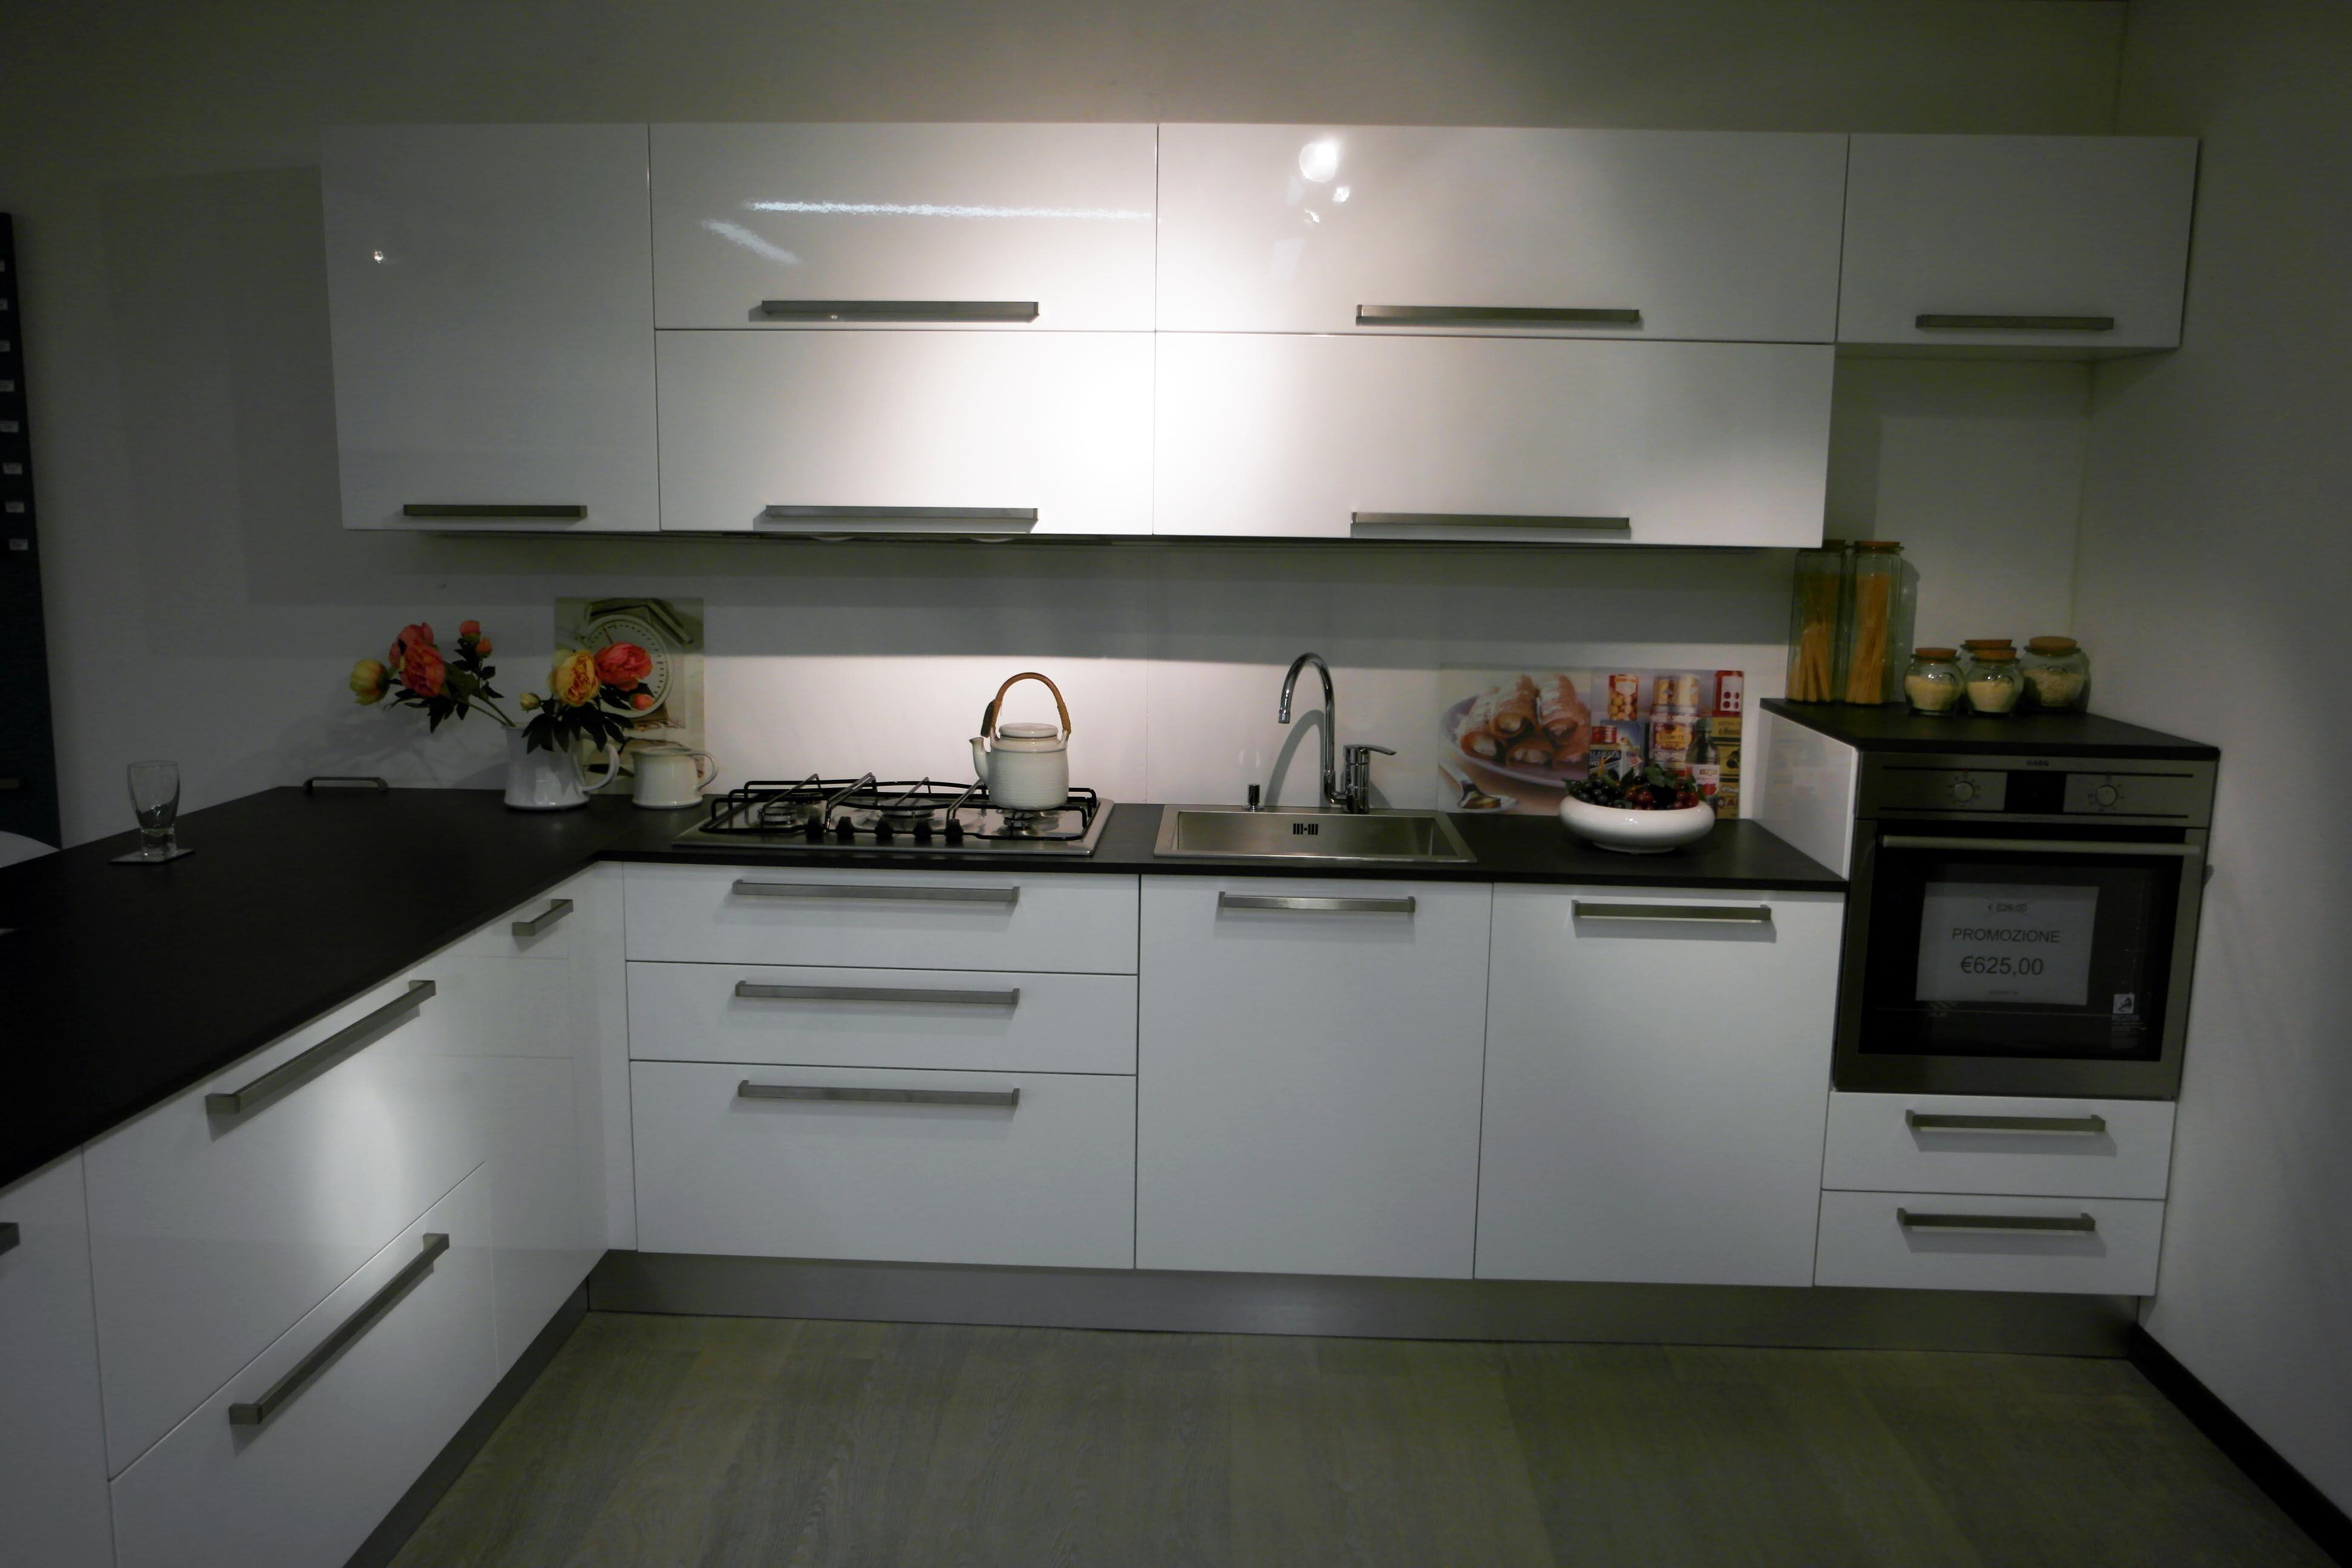 Cucina gentili cucine piana lux laminato lucido outlet - Top cucina in laminato ...